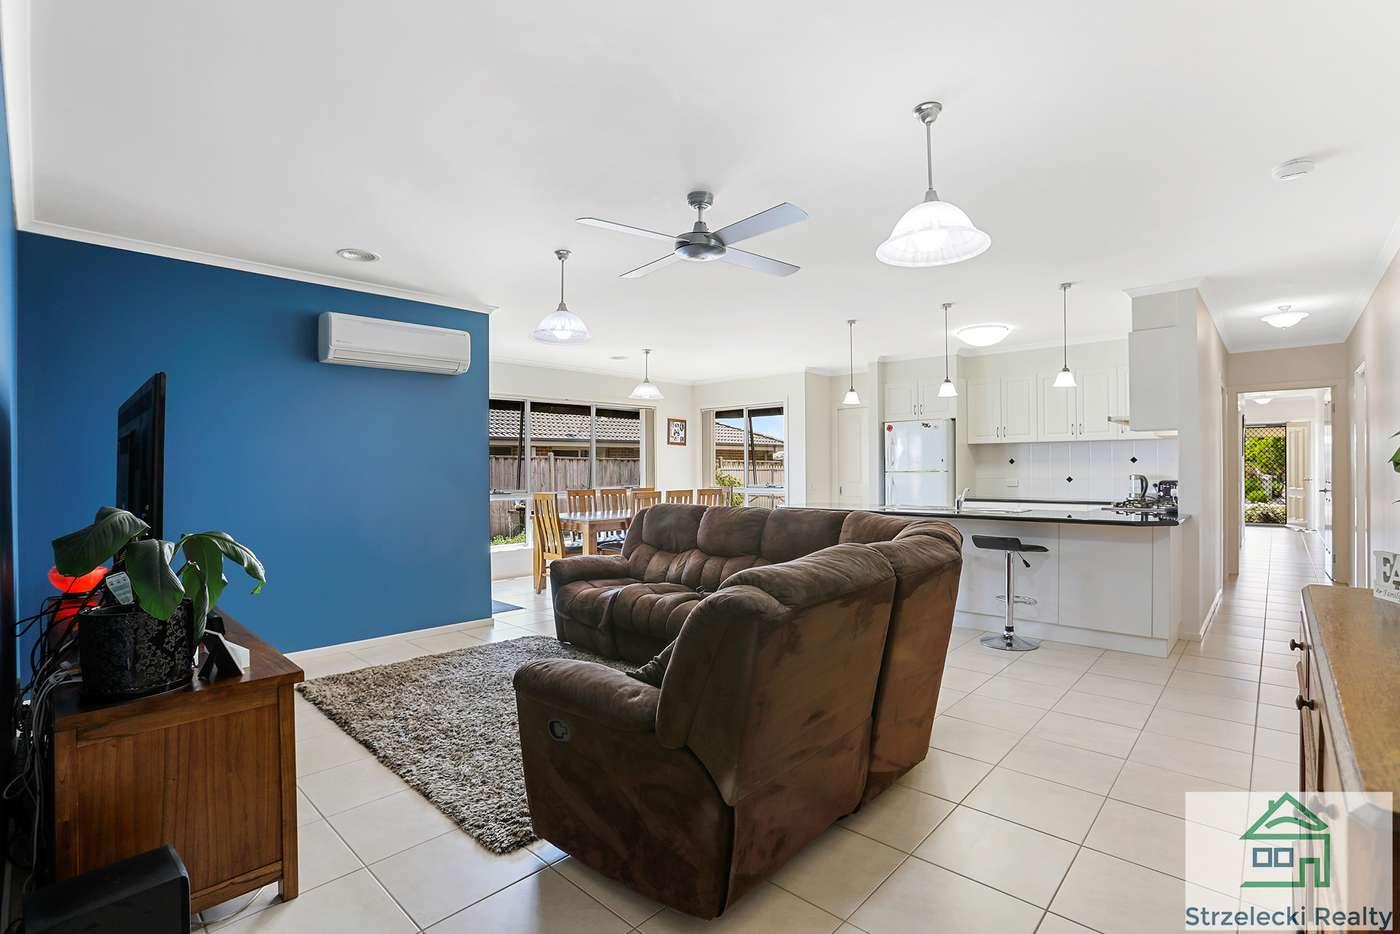 Sixth view of Homely house listing, 43 Murray St, Trafalgar VIC 3824